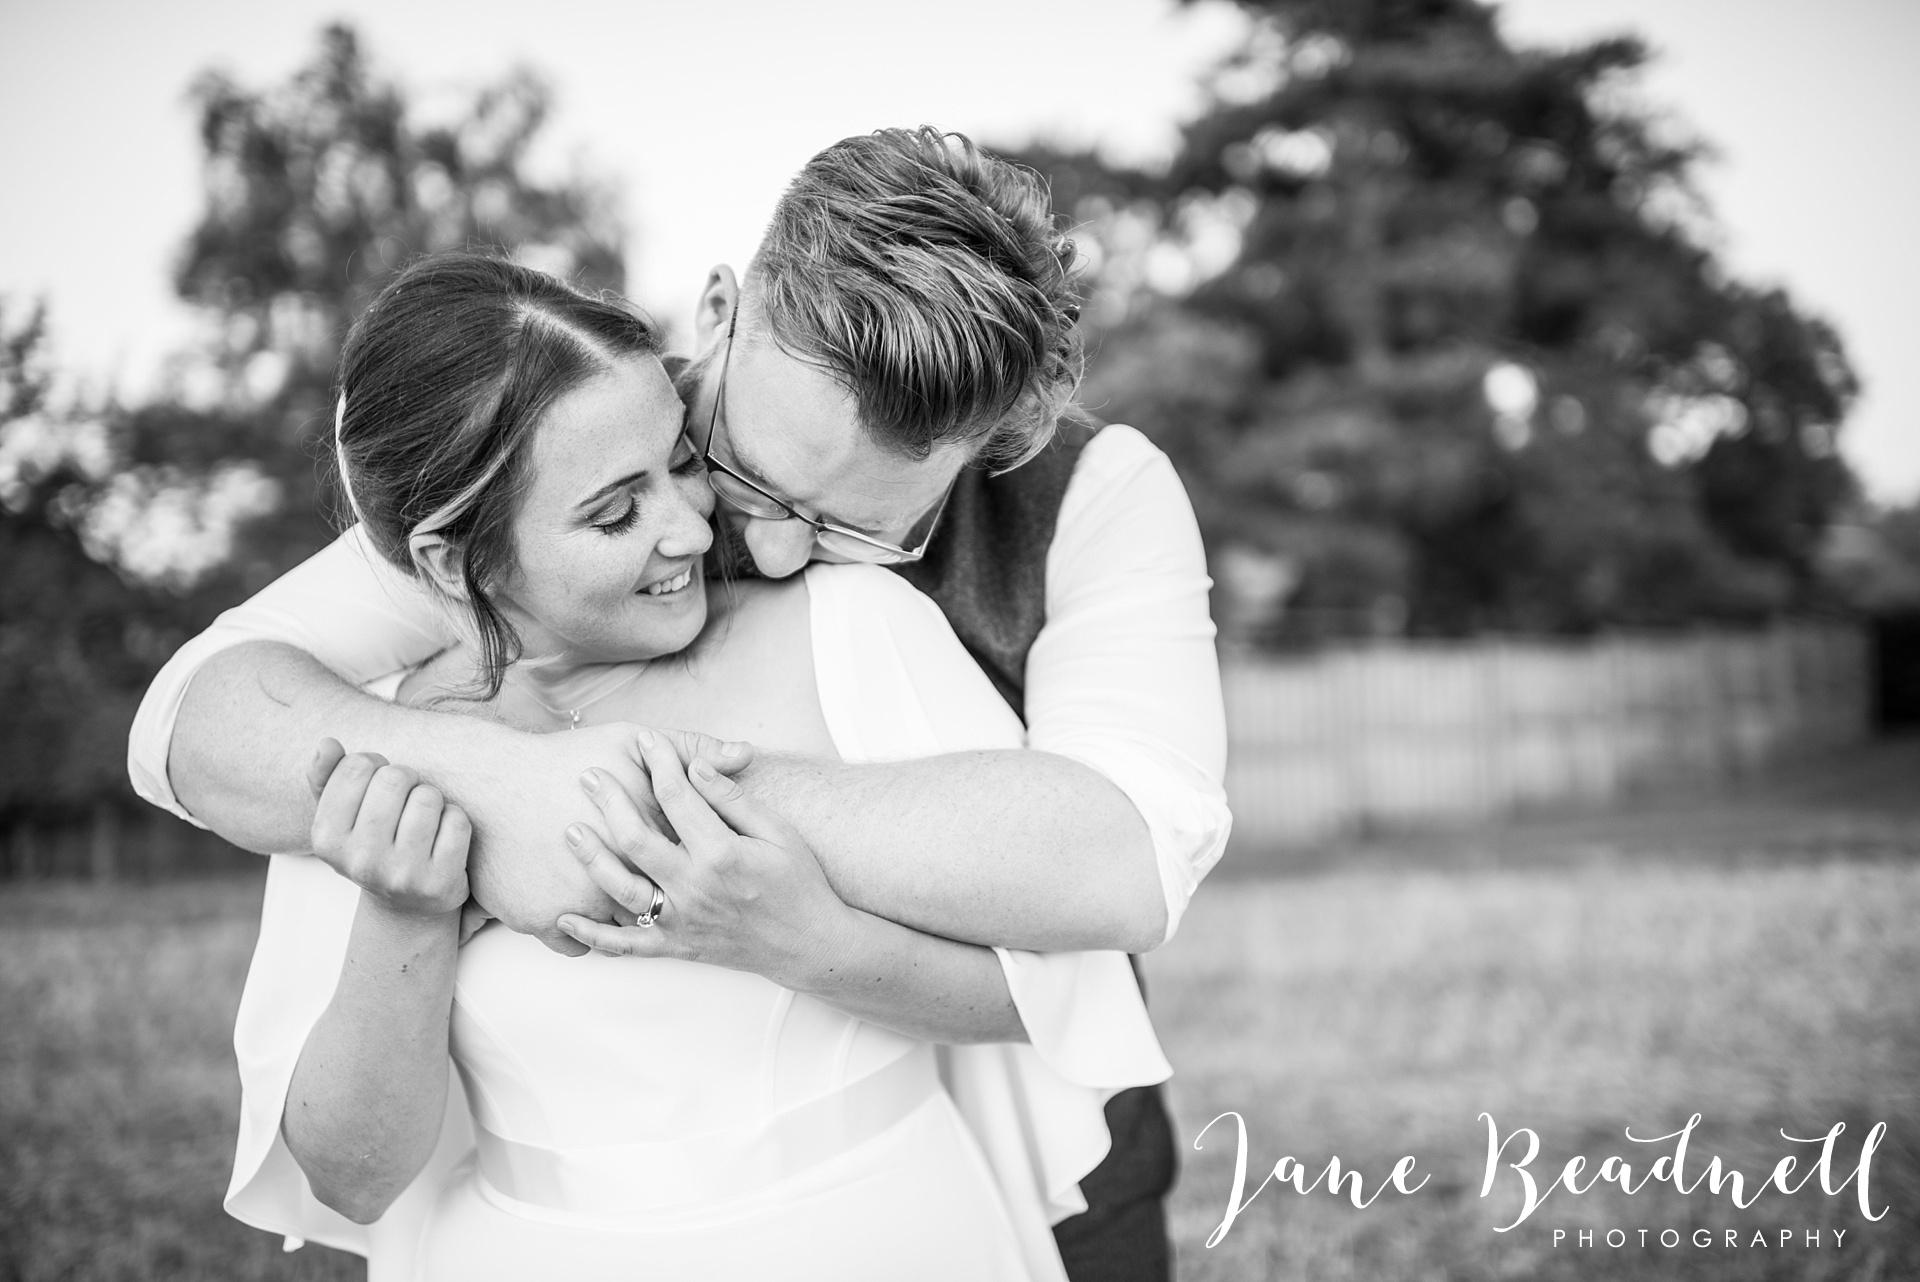 fine-art-wedding-photographer-jane-beadnell-yorkshire-wedding-photographer_0159